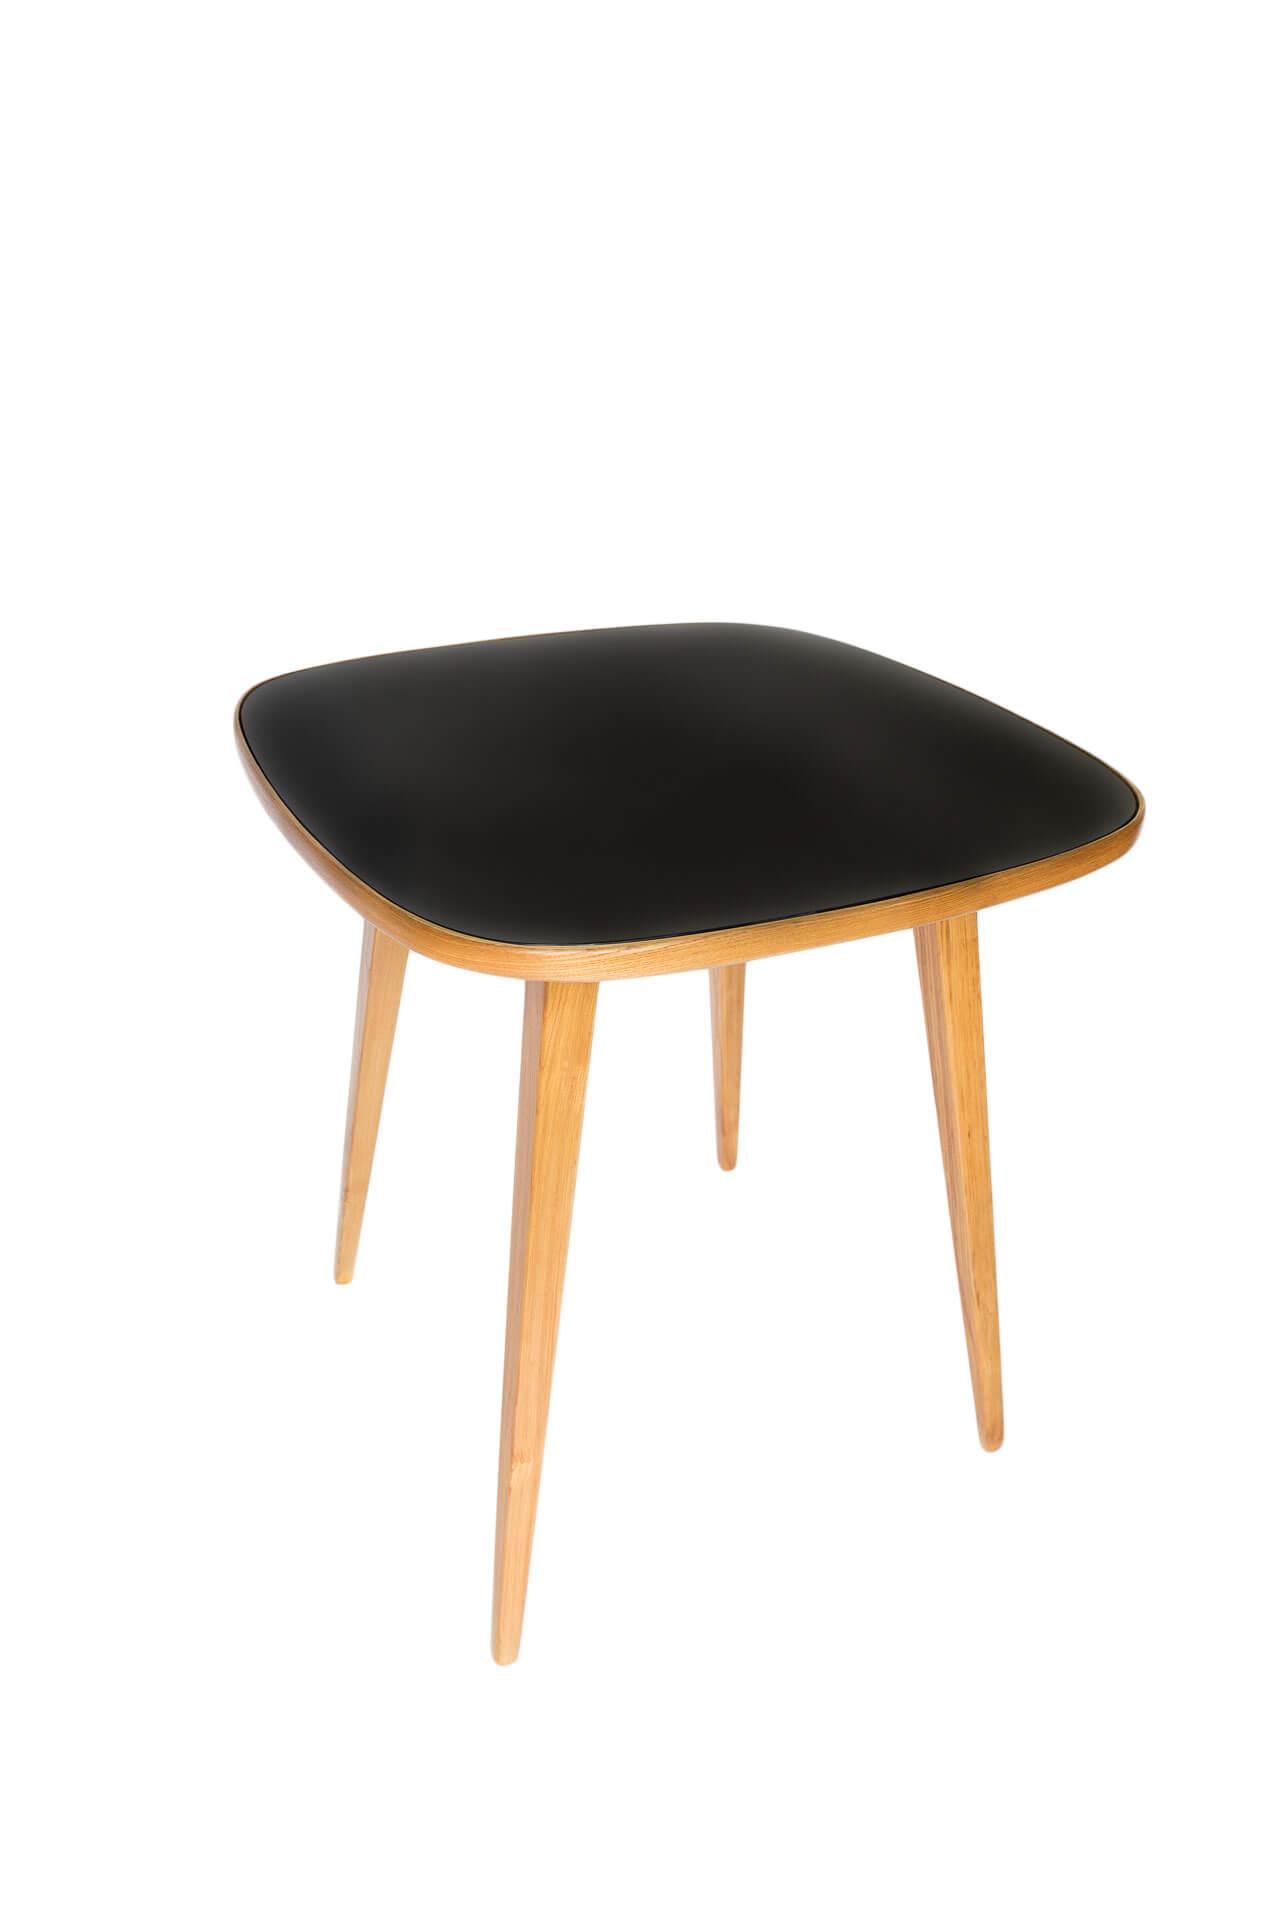 Café Table for ŁAD Cooperative, by H. Lachert